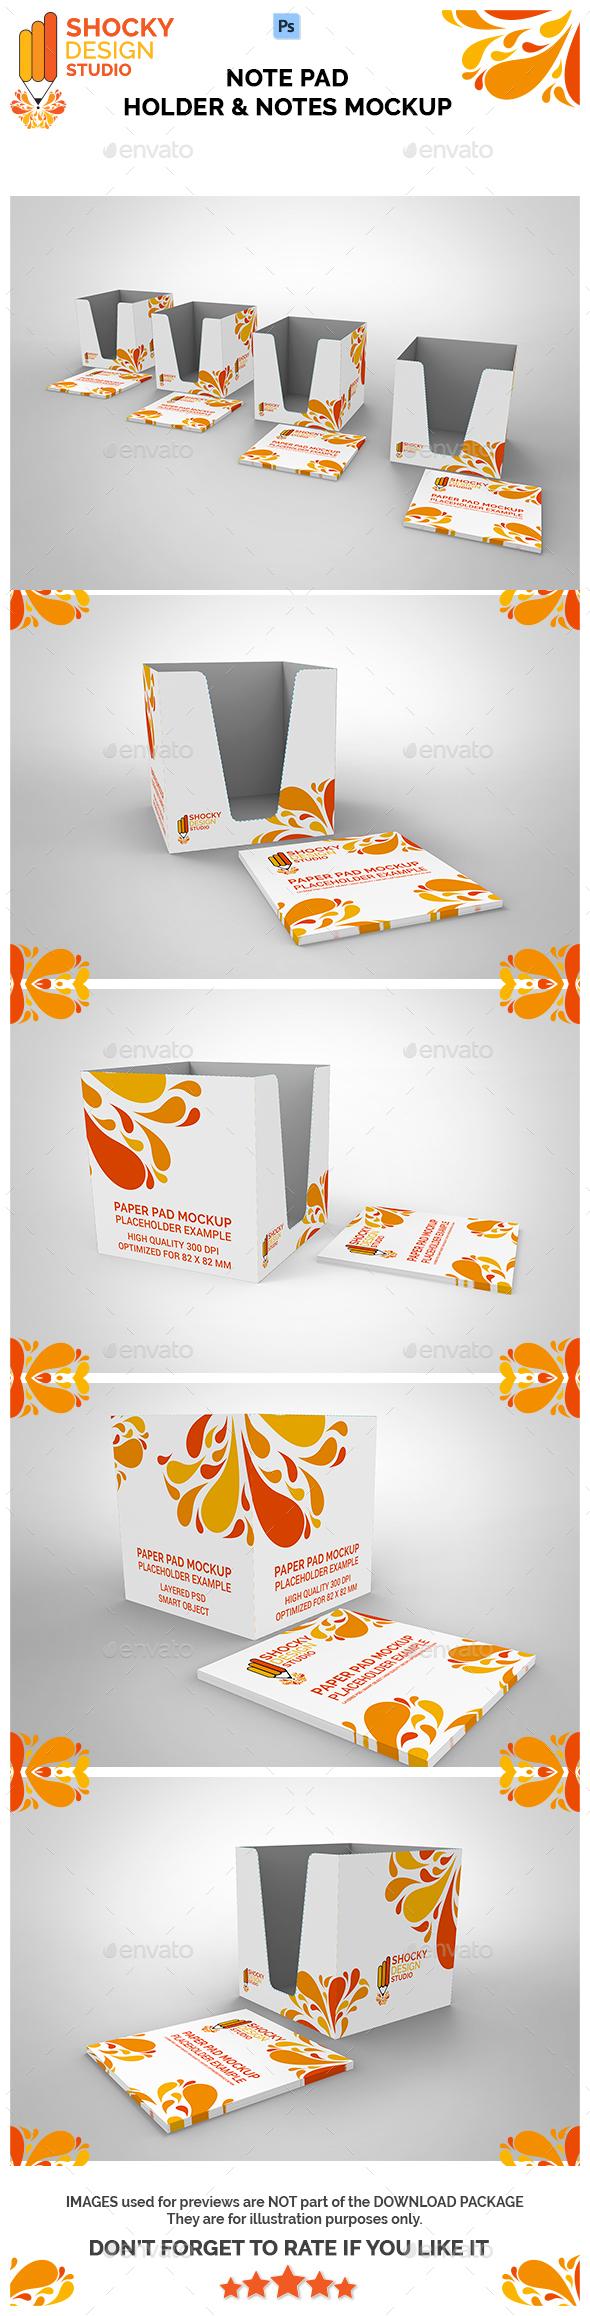 Note Pad Holder & Notes Mockup - Packaging Product Mock-Ups